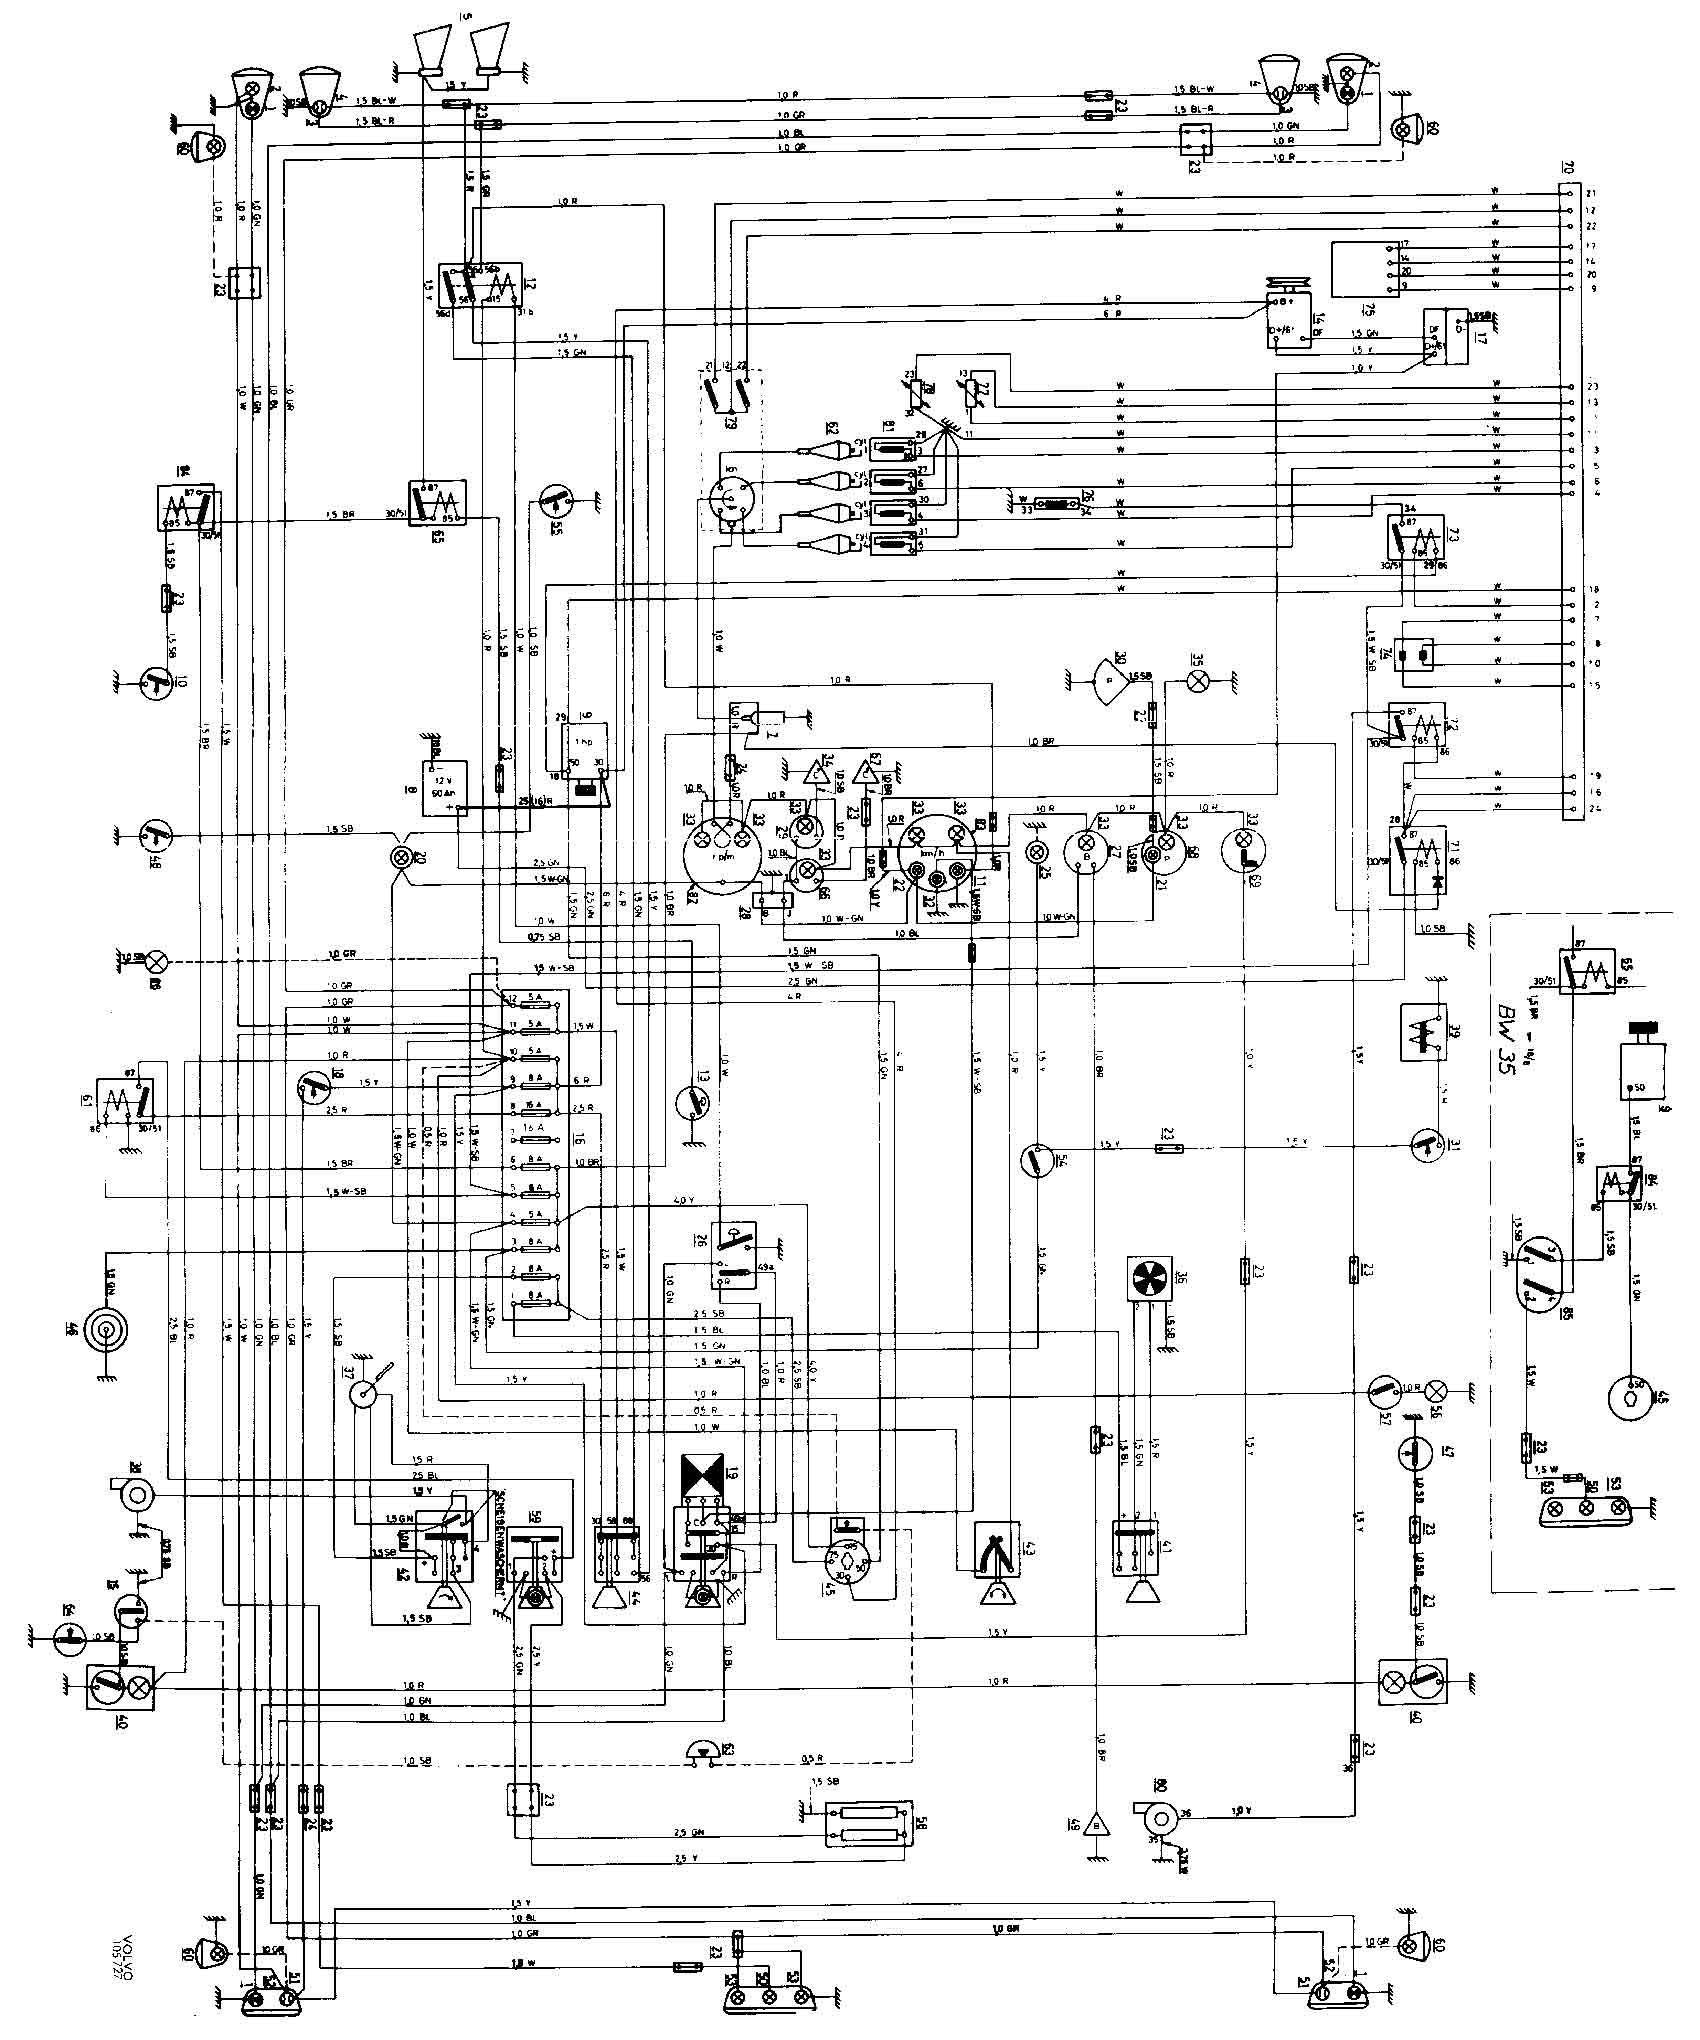 volvo fl6 wiring diagram